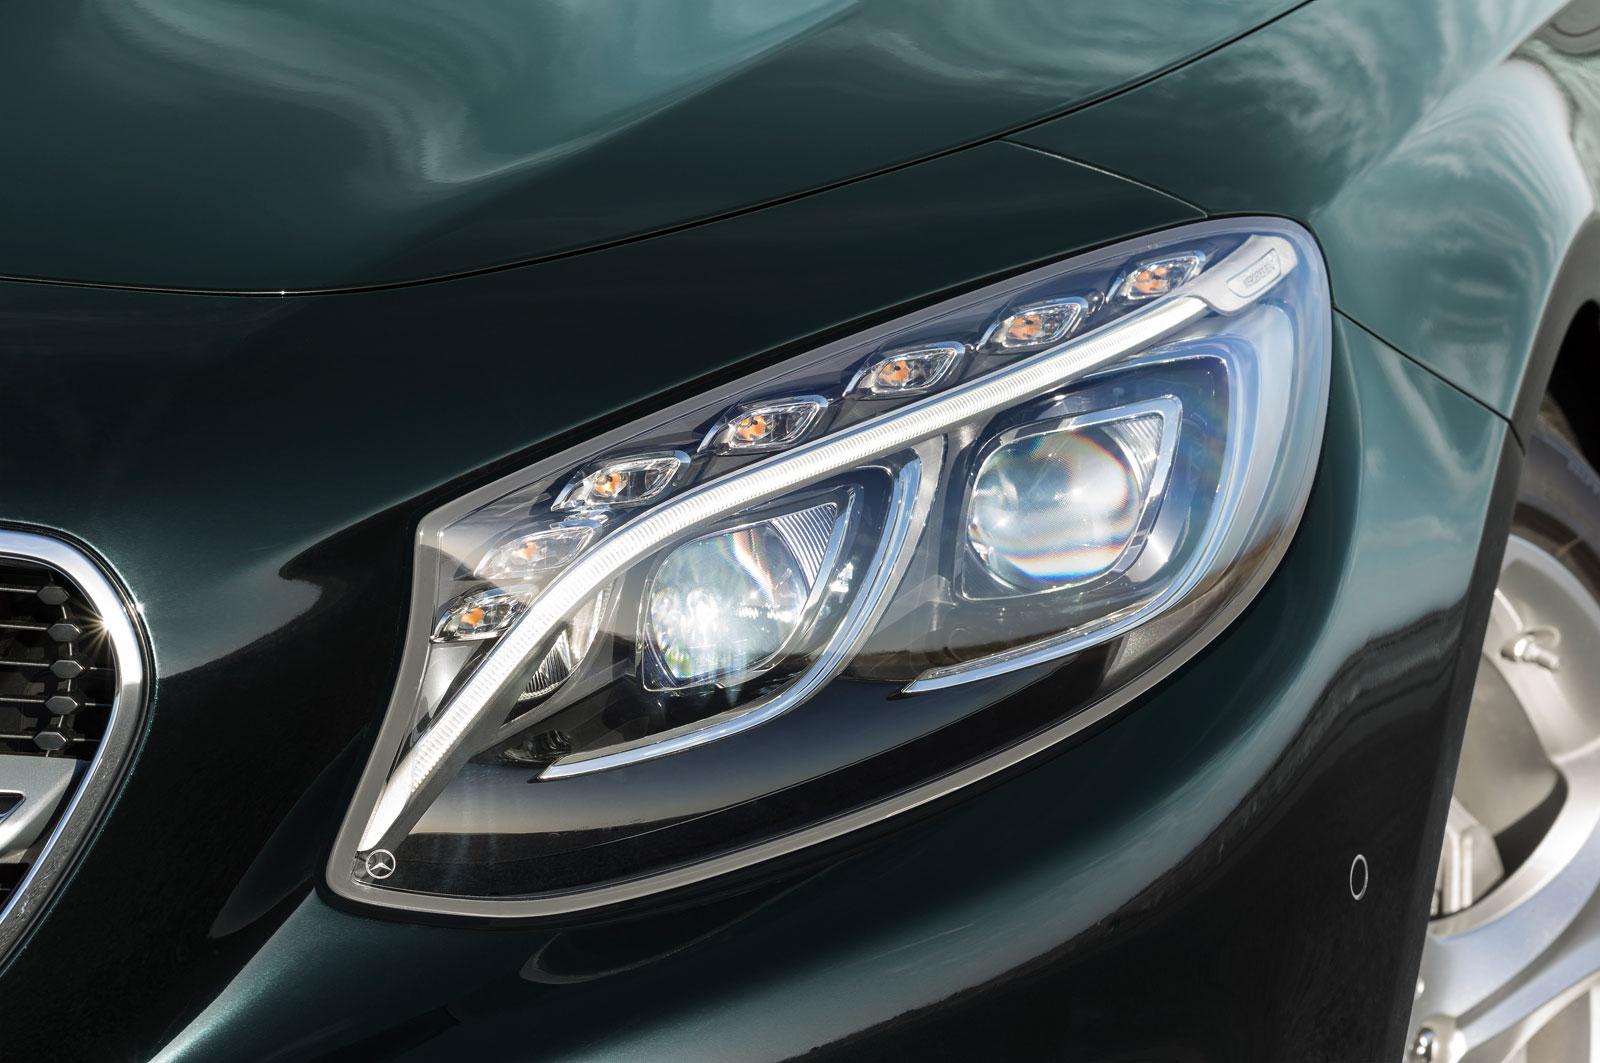 Mercedes Benz S Class Coupe Headlight Car Body Design